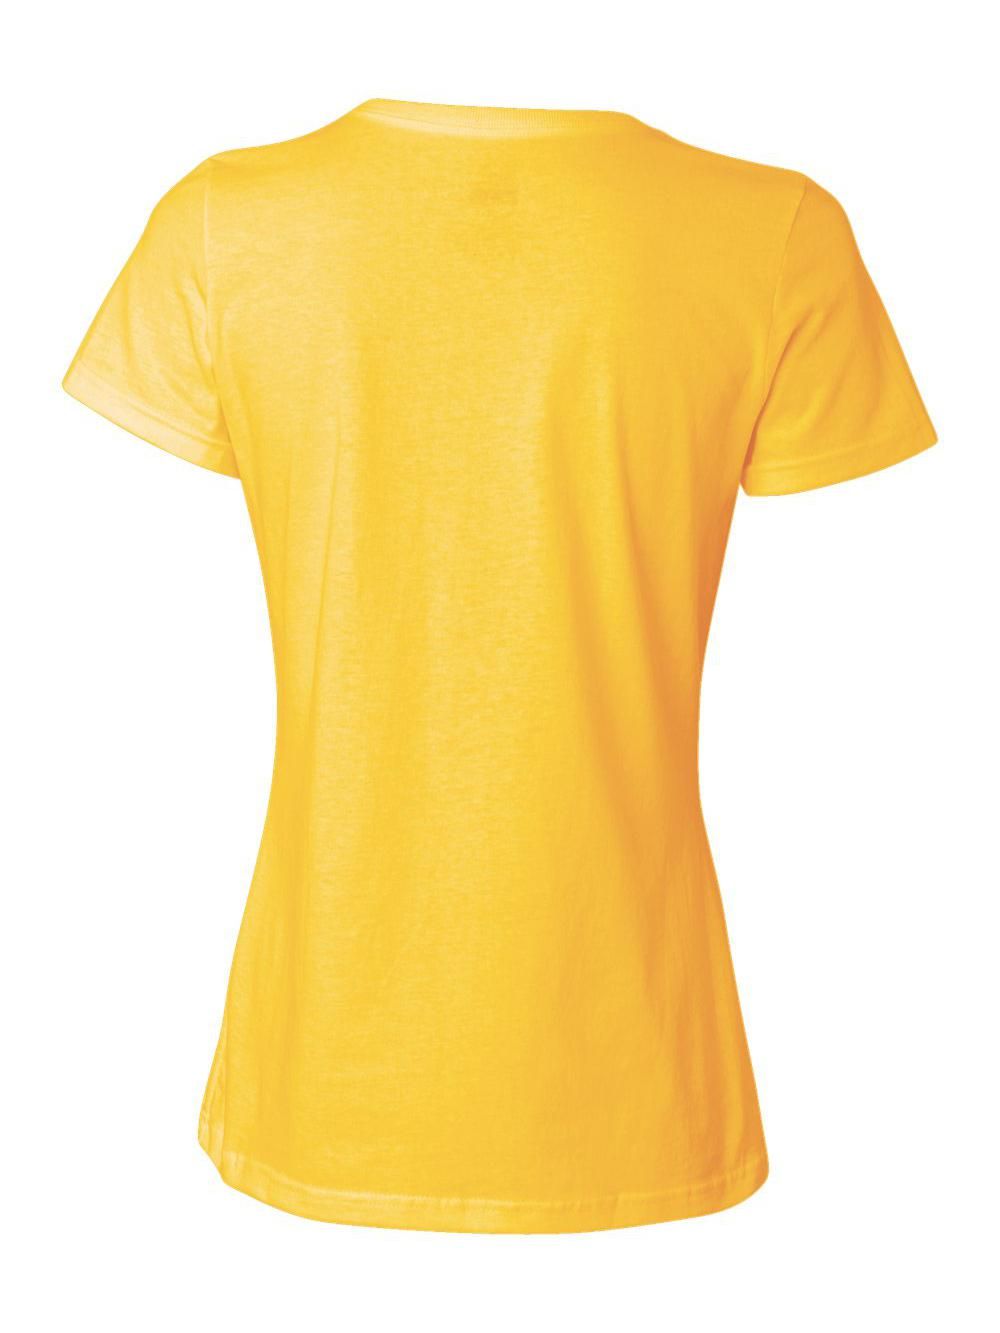 Fruit-of-the-Loom-HD-Cotton-Women-039-s-Short-Sleeve-T-Shirt-L3930R thumbnail 43